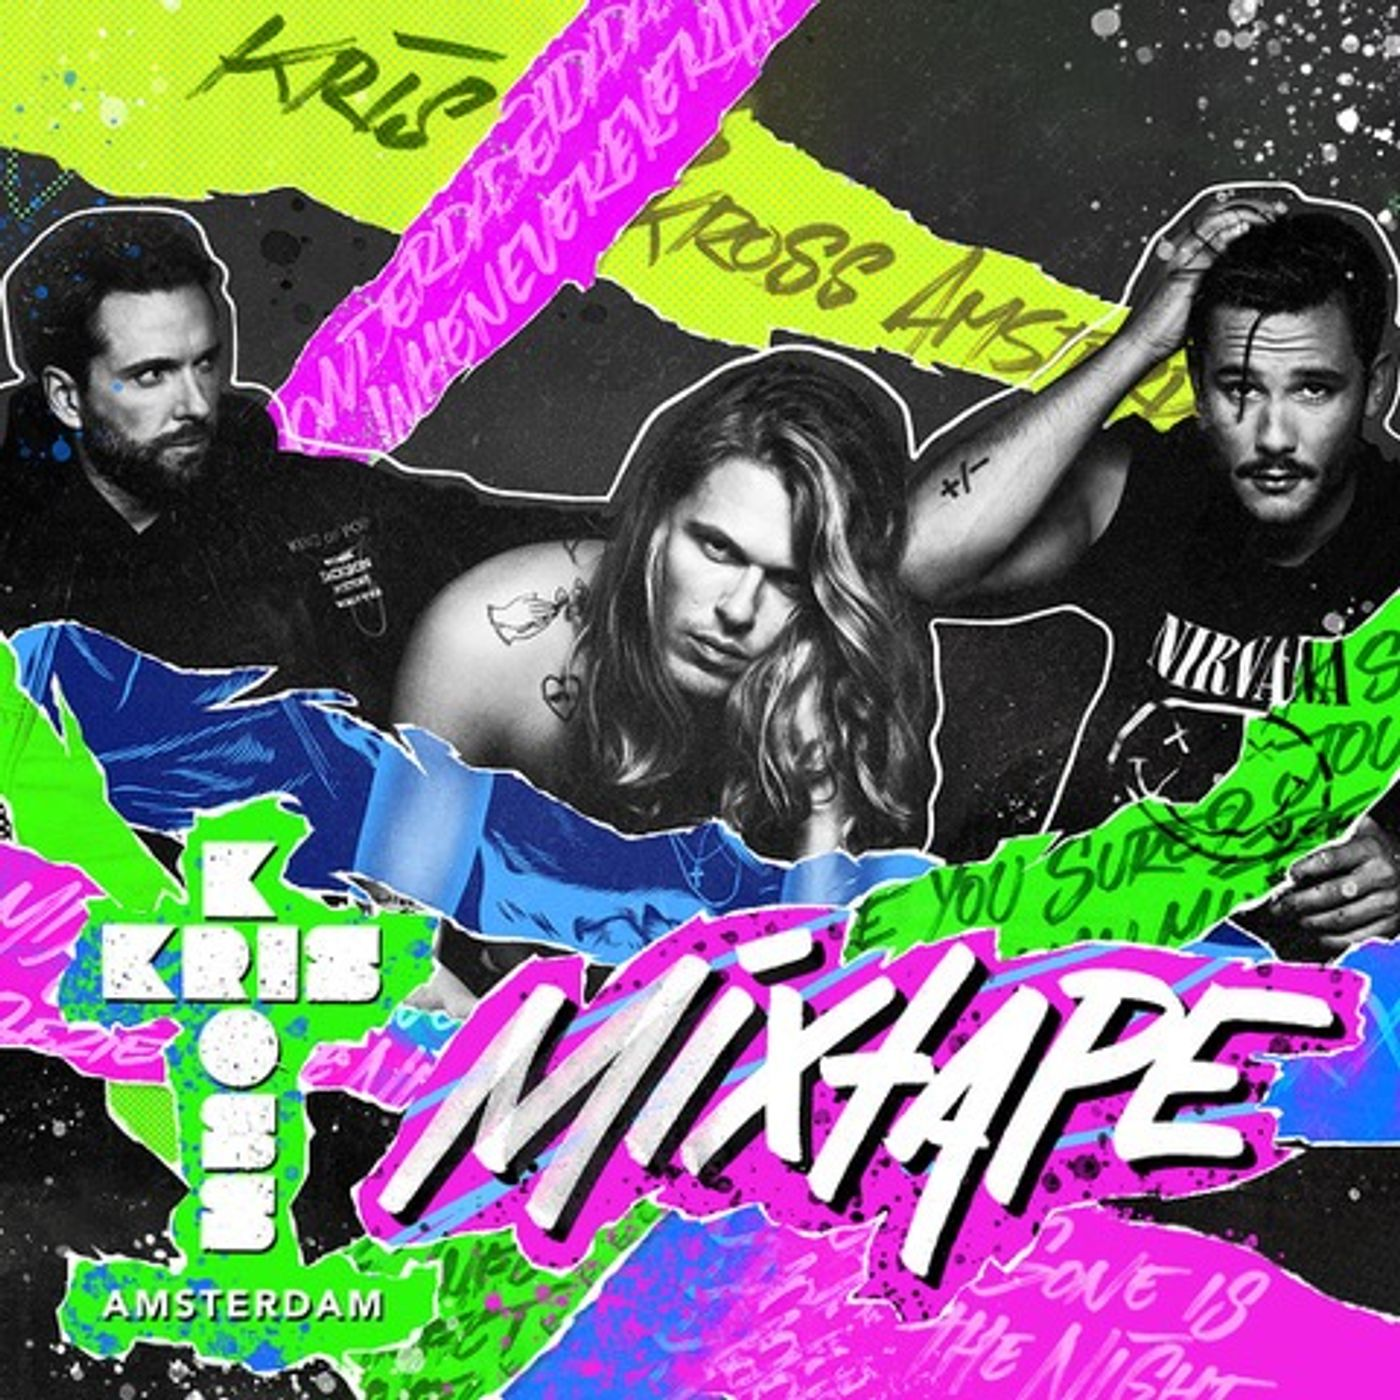 Kris Kross Amsterdam | Kris Kross Mixtape #120